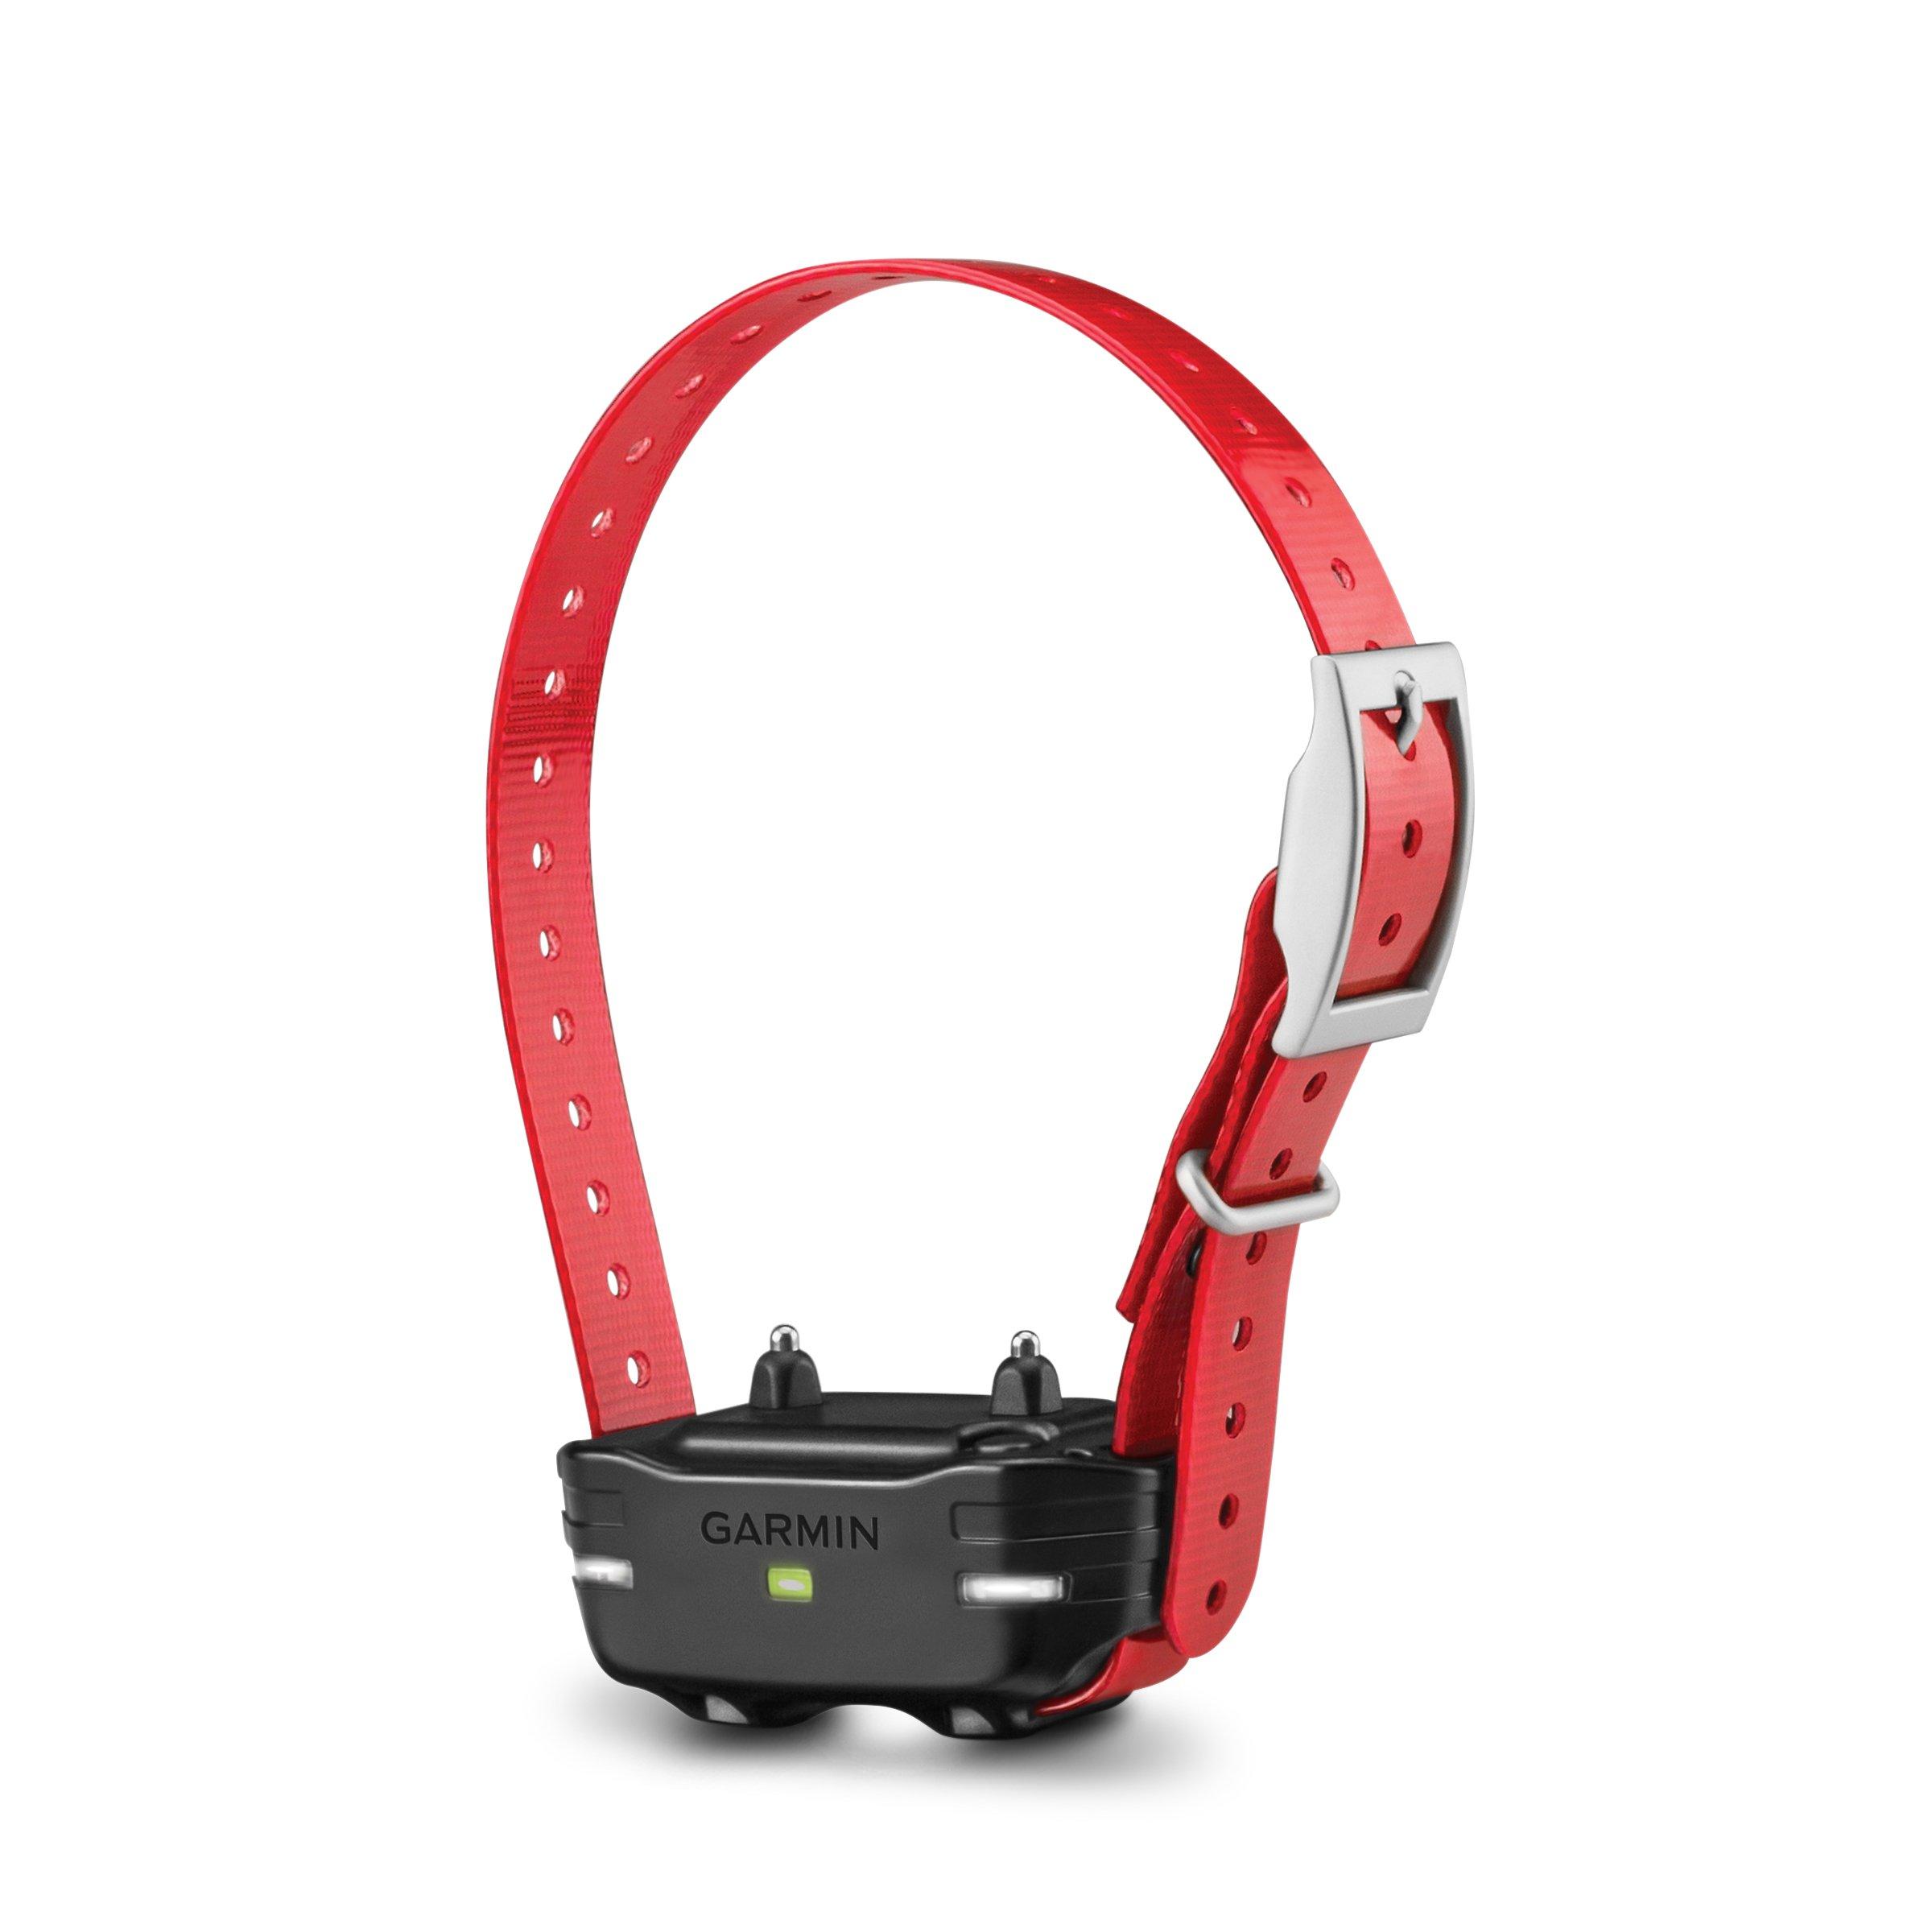 Garmin PT10 Dog Device Red Collar (Pro 70/Pro 550) by Garmin